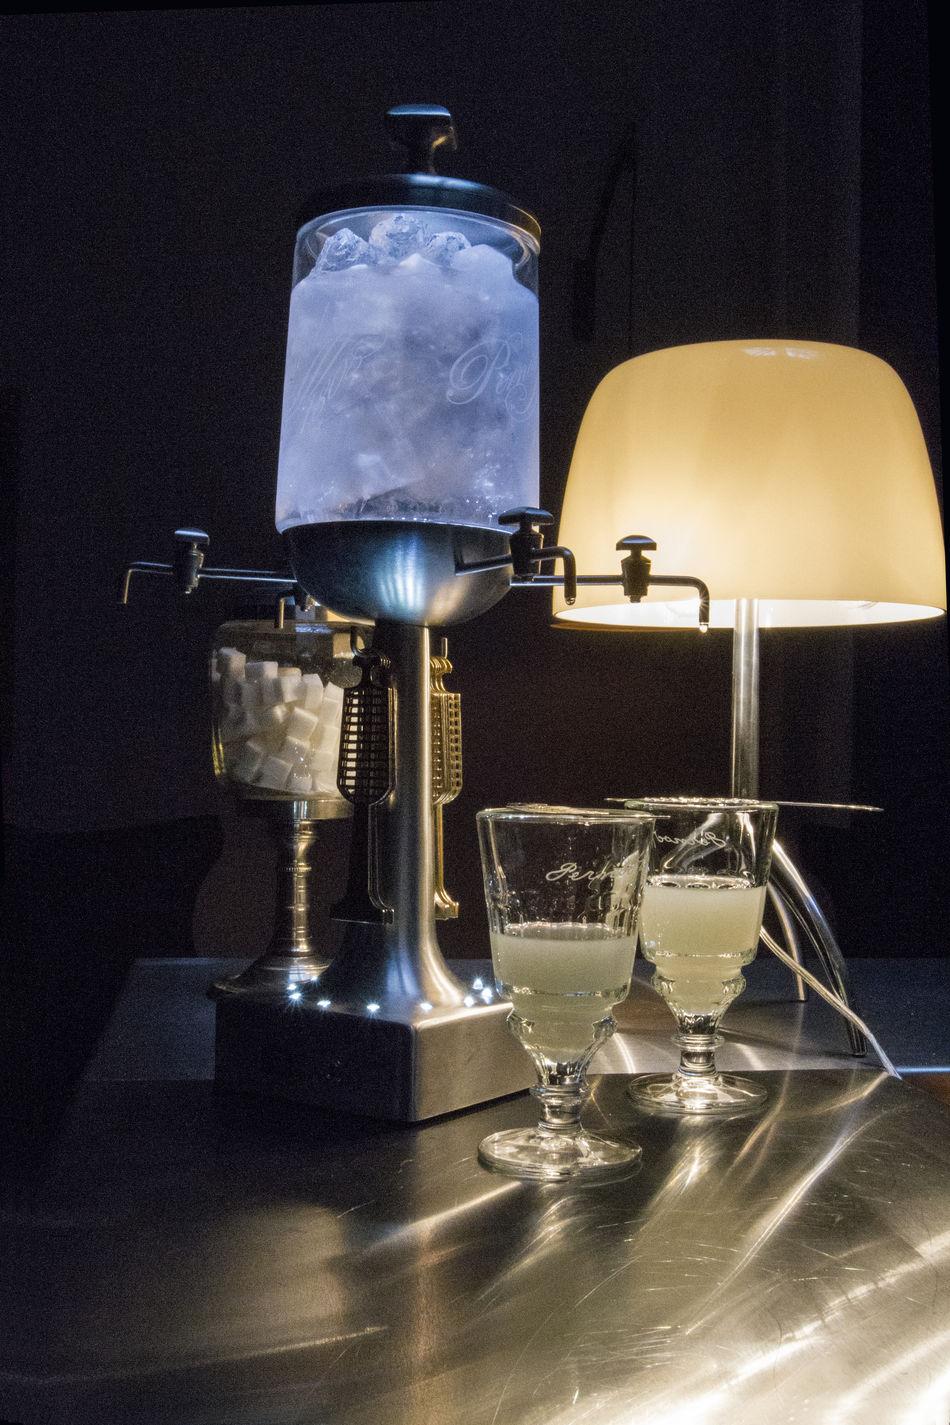 Absinth Alcool  Bar Byrrh, Thuir, Art Close-up Drink Indoors  Martini Glass No People Refreshment Restaurant Shiny Table